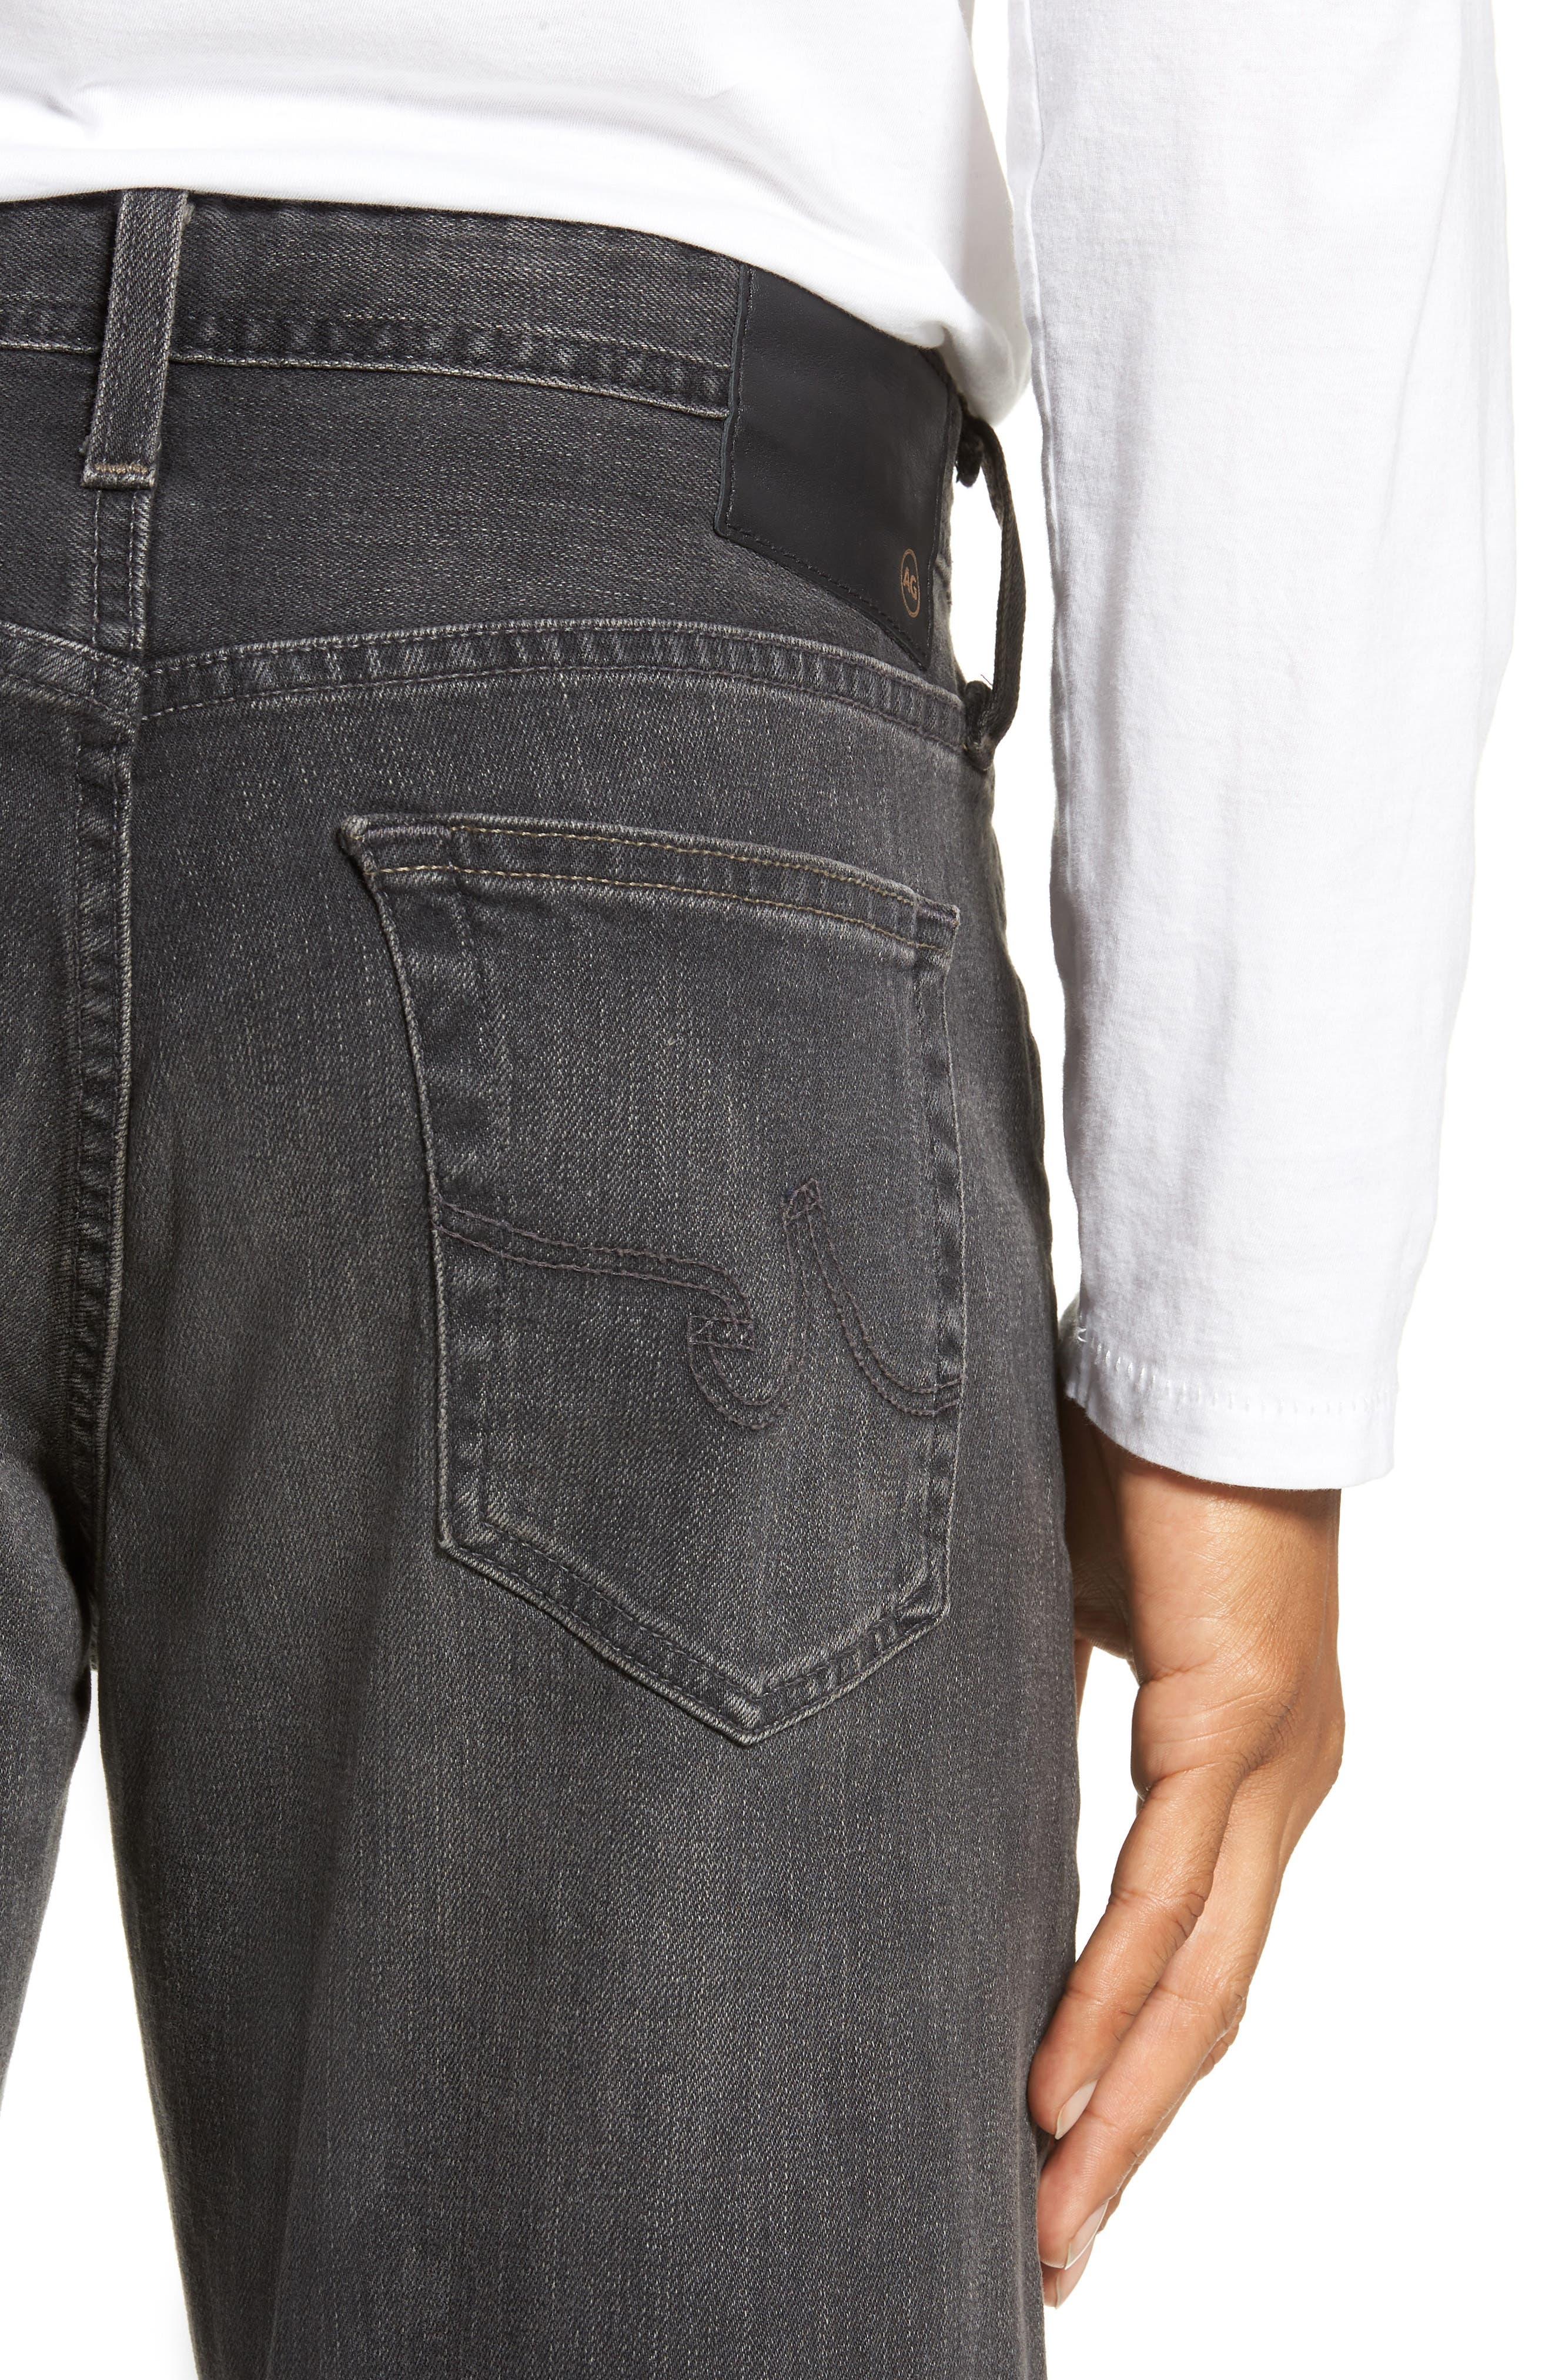 Graduate Slim Straight Leg Jeans,                             Alternate thumbnail 4, color,                             6 YEARS ARCADE